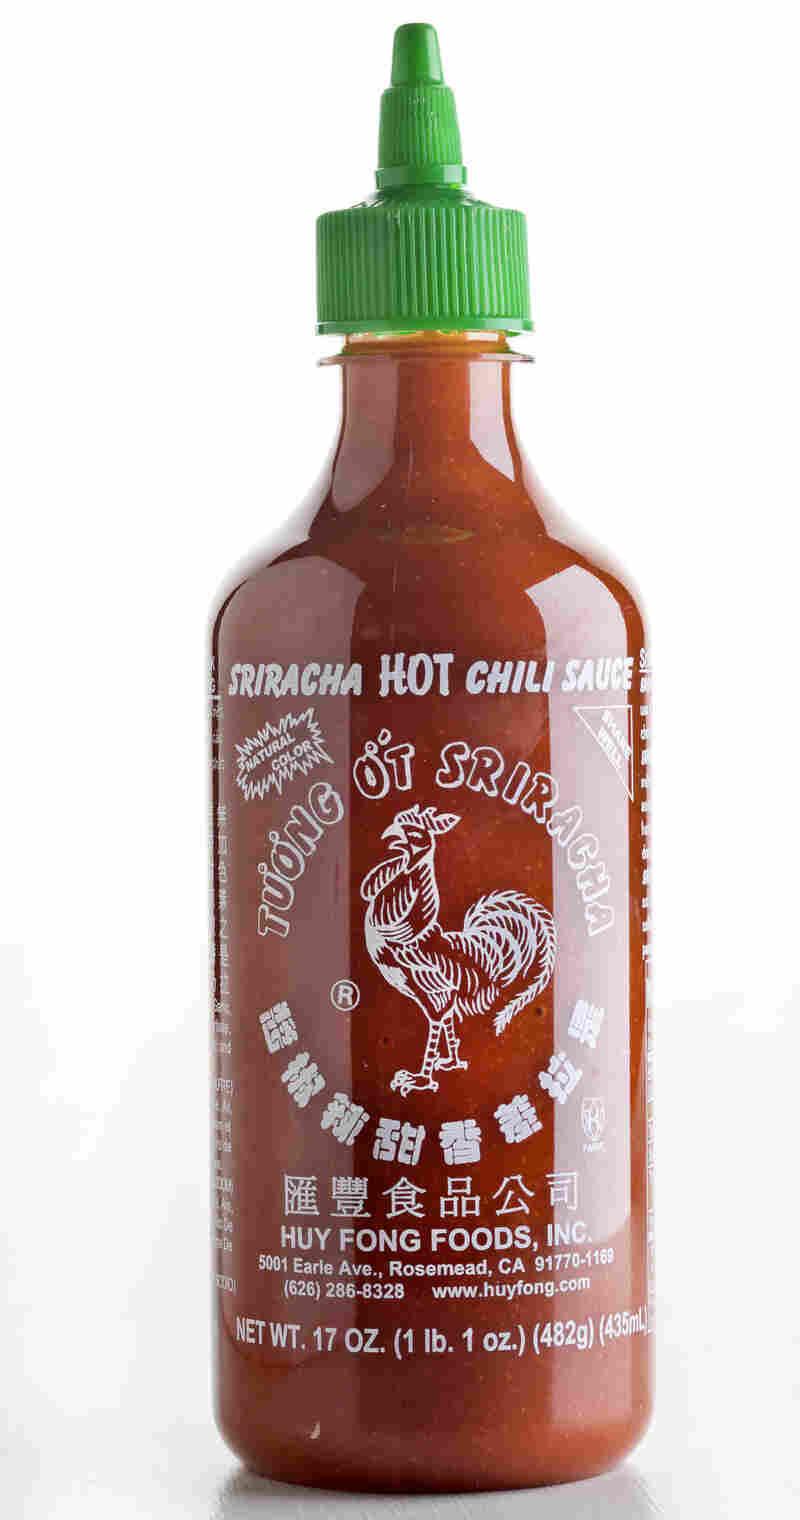 Sriracha sauce.